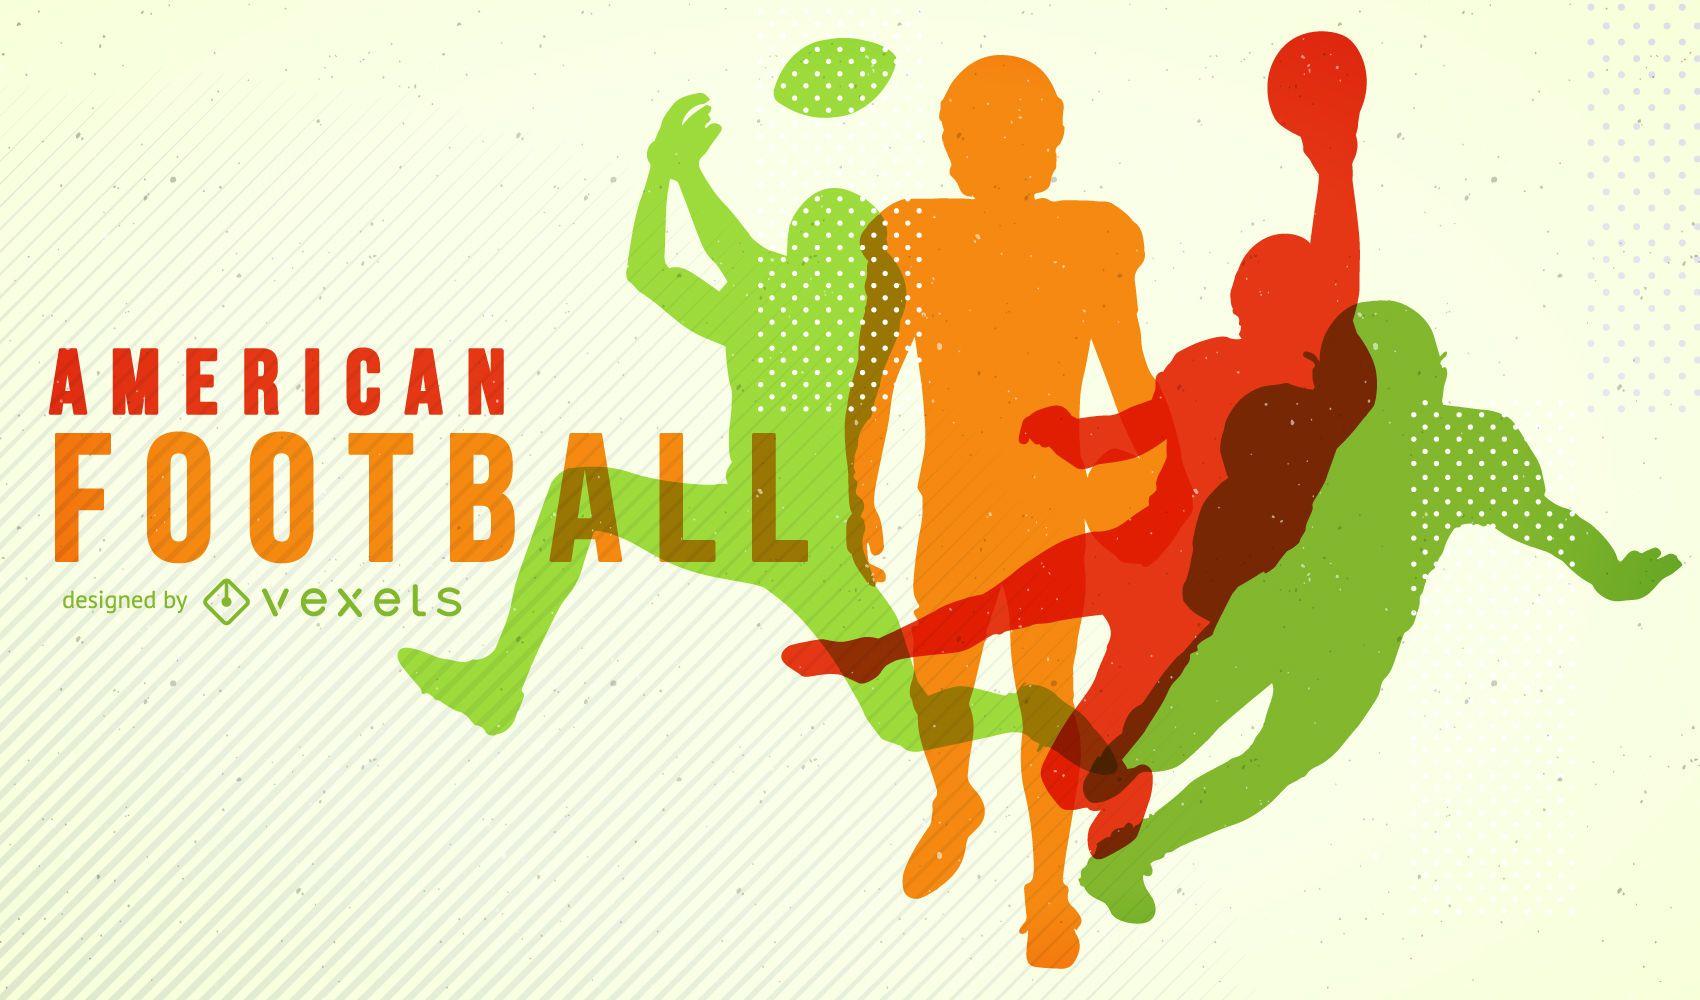 Cartel de silueta de fútbol americano colorido